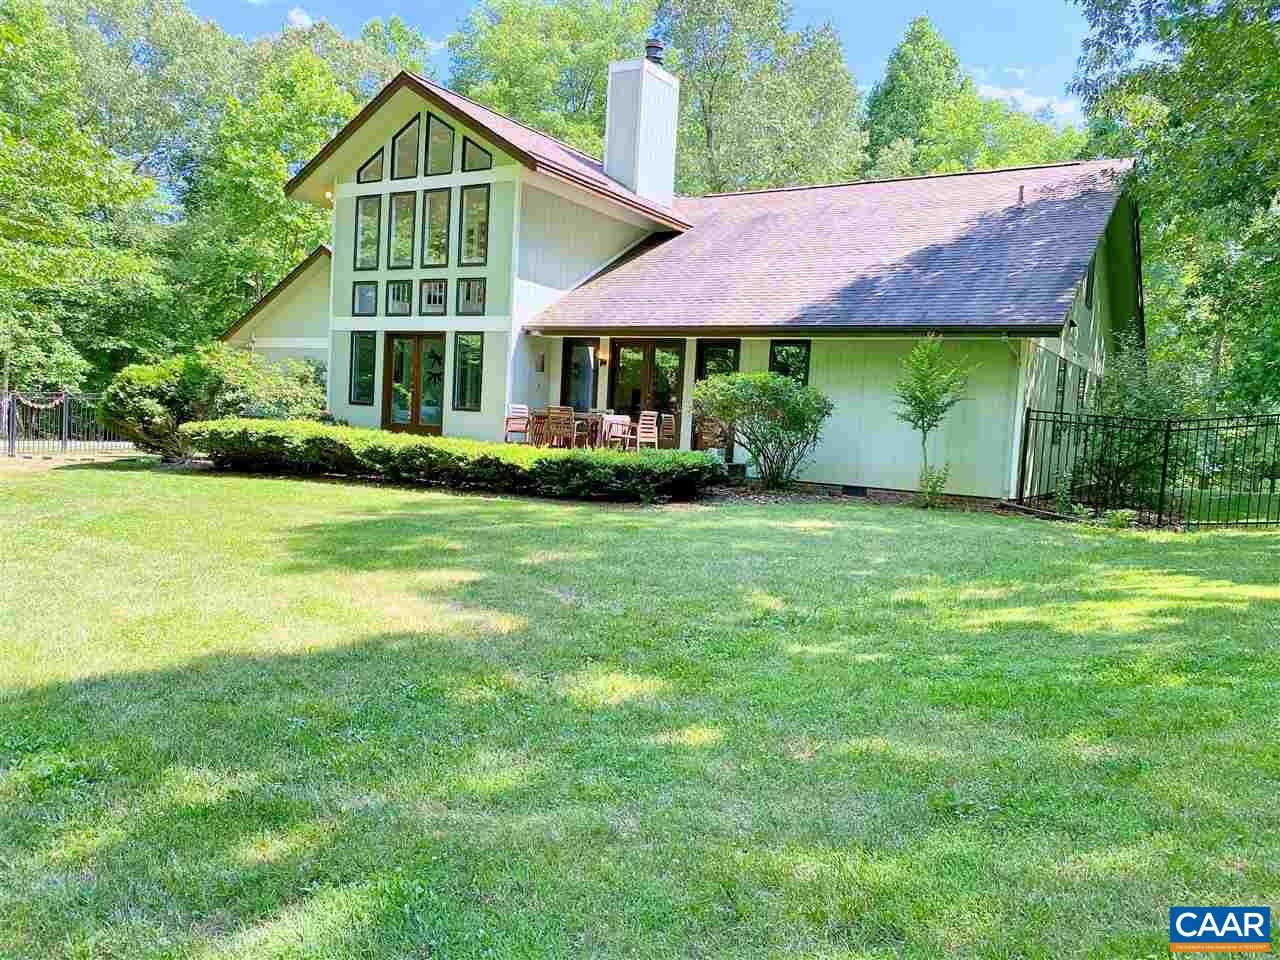 158 ROSECLIFF FARMS RD, AMHERST, VA 24521